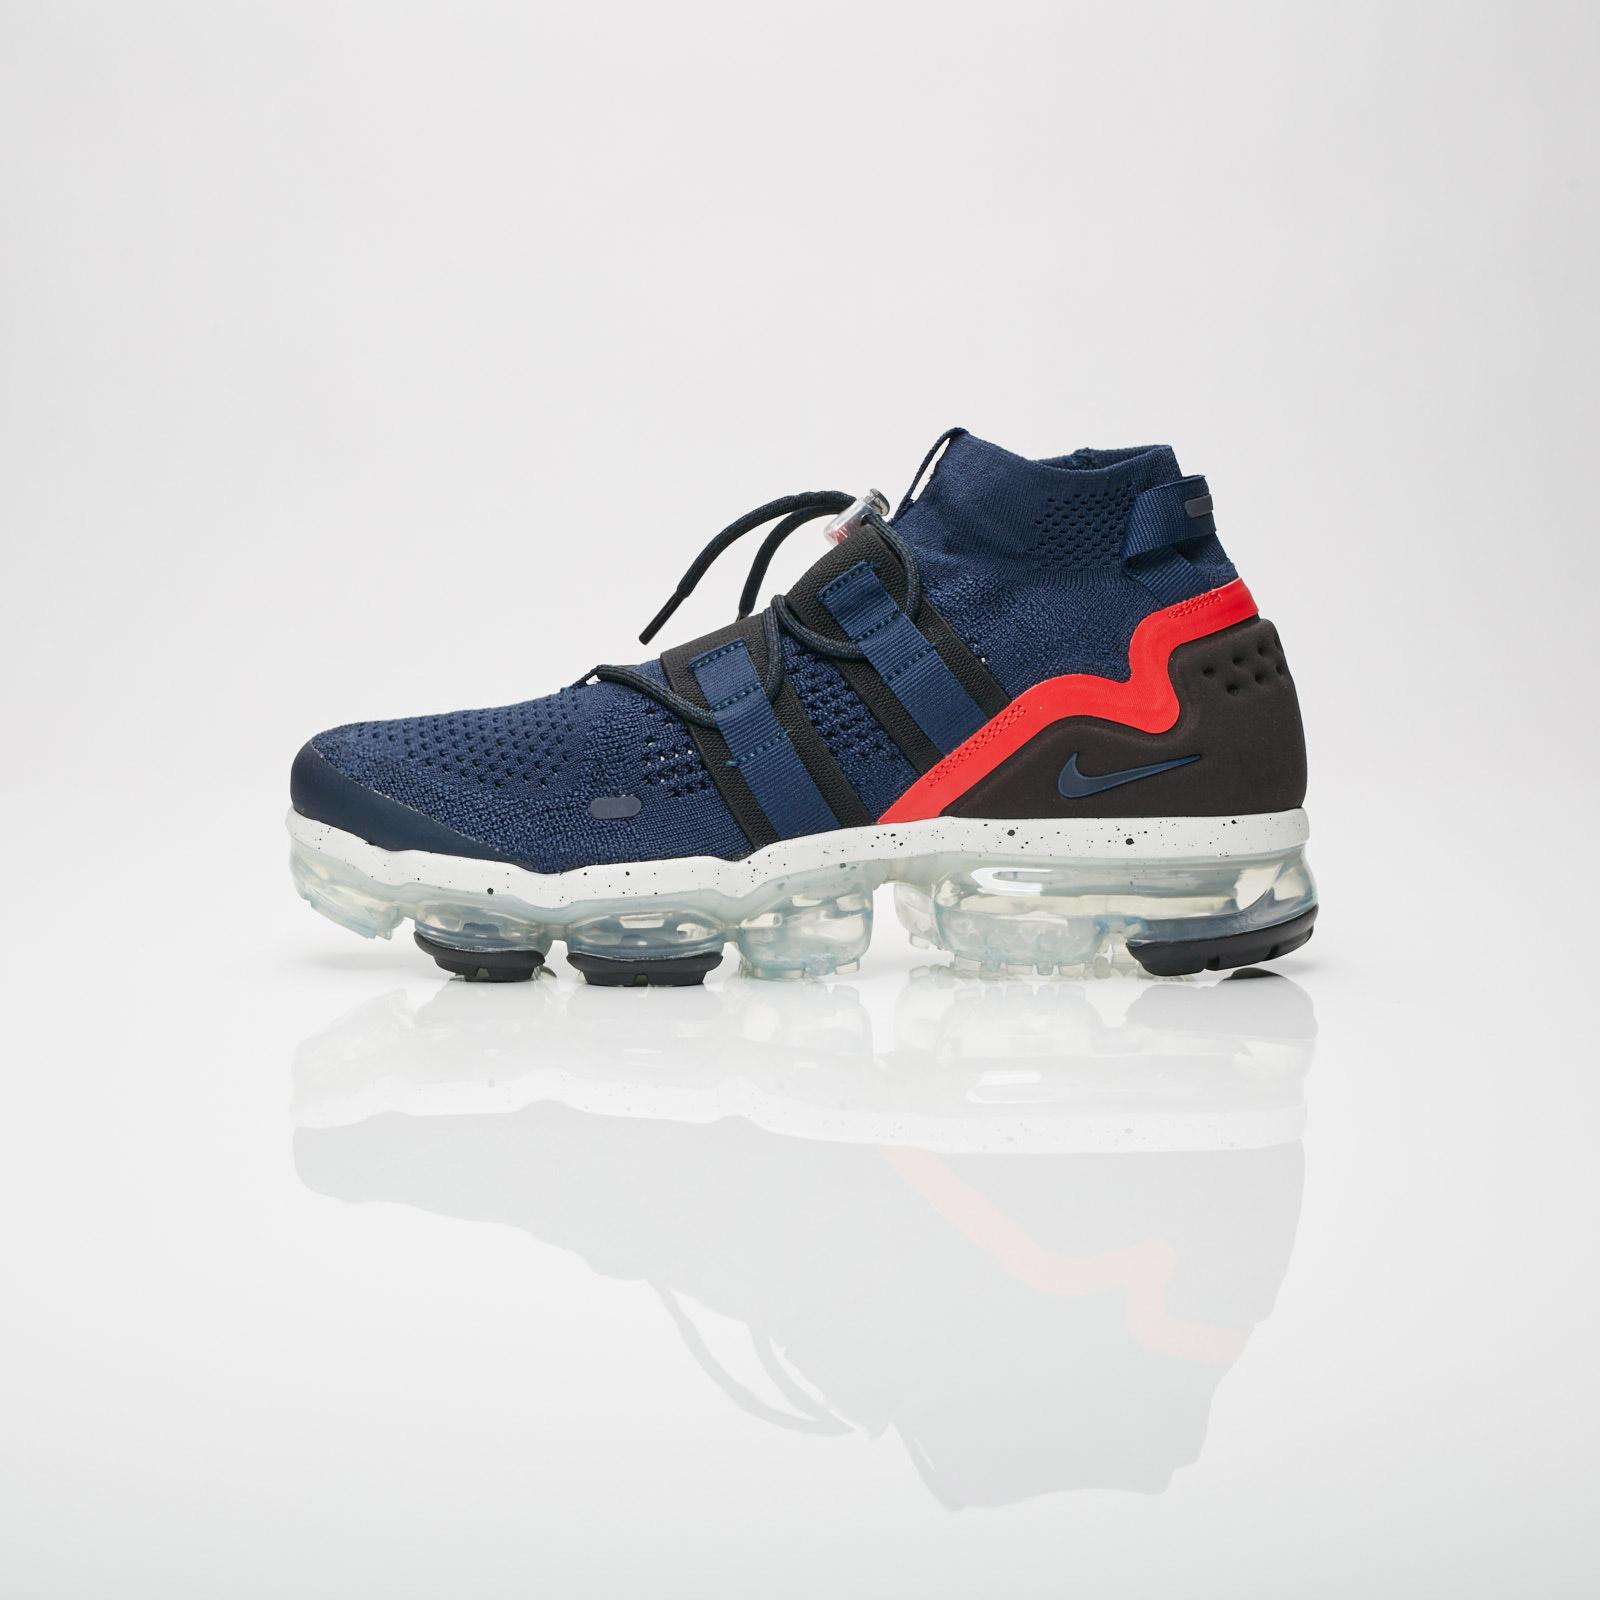 online retailer 39bdf b5a62 Nike Air Vapormax FK Utility - Ah6834-406 - Sneakersnstuff ...